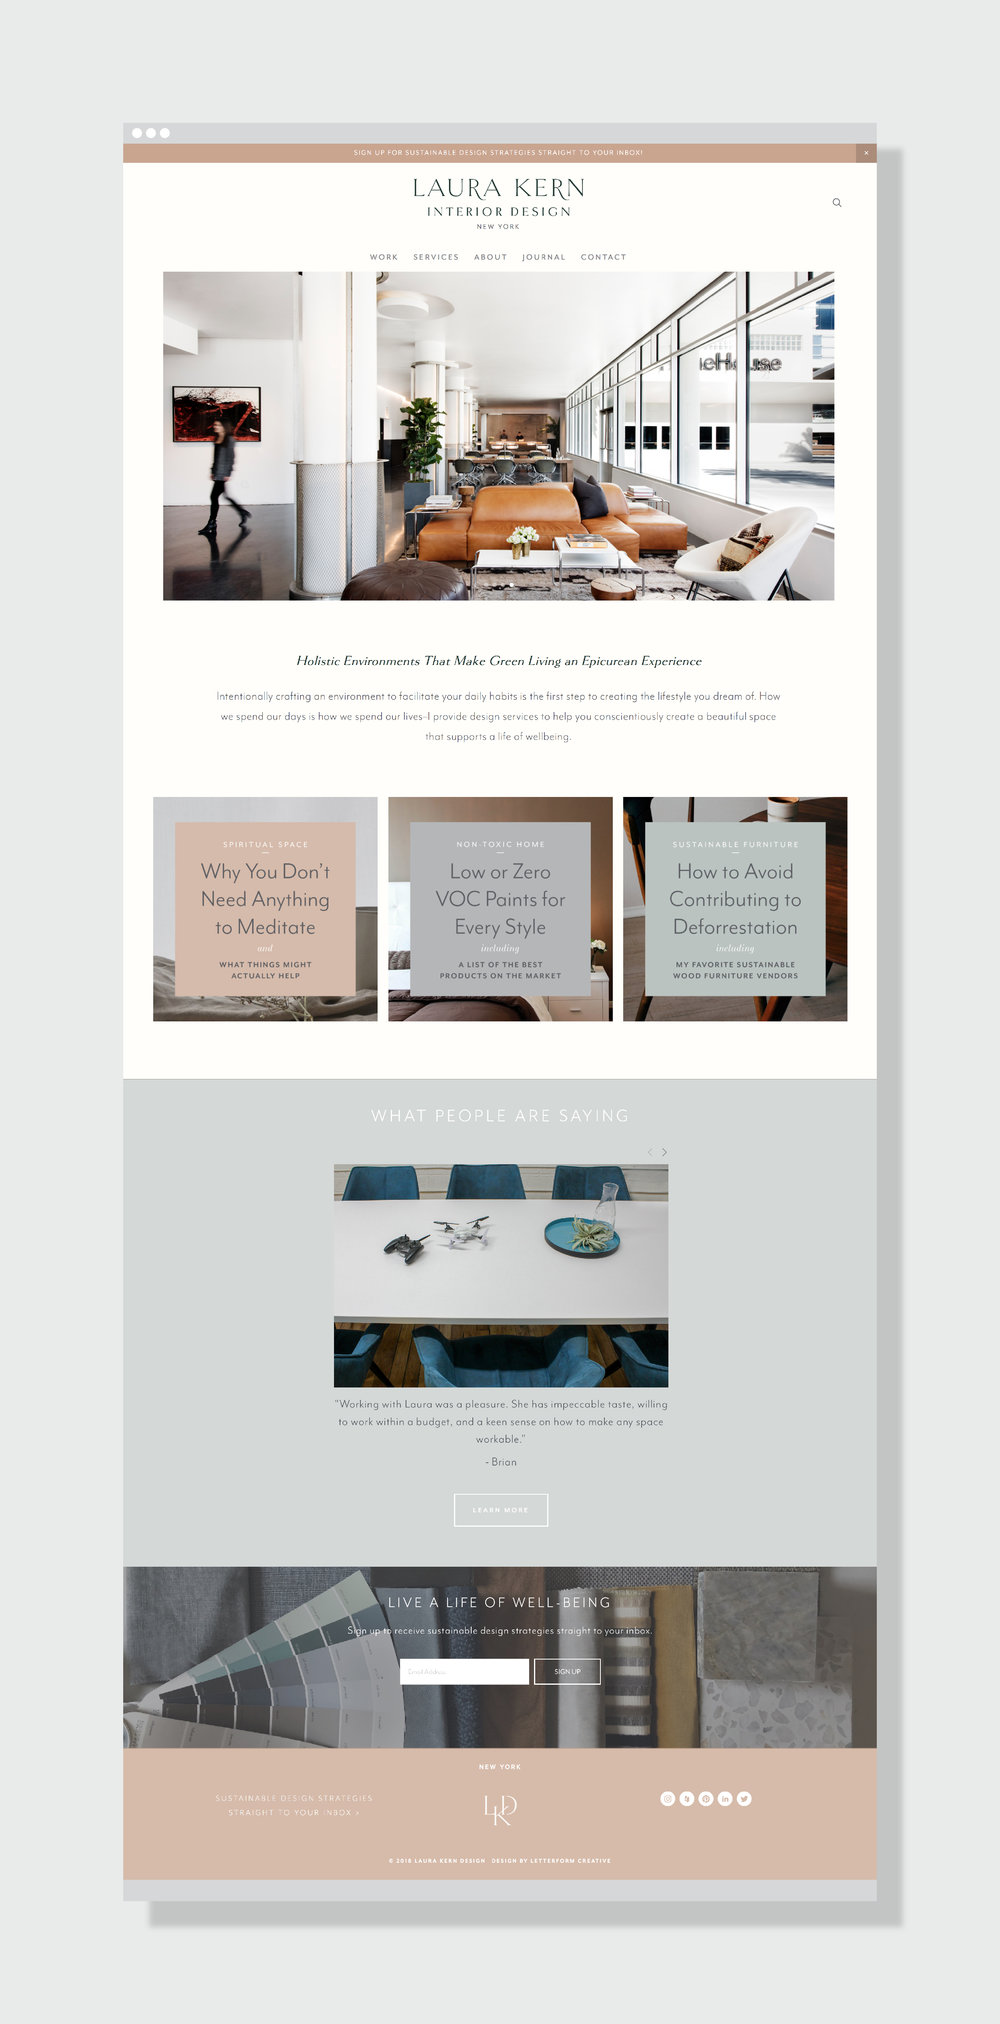 Laura Kern Design